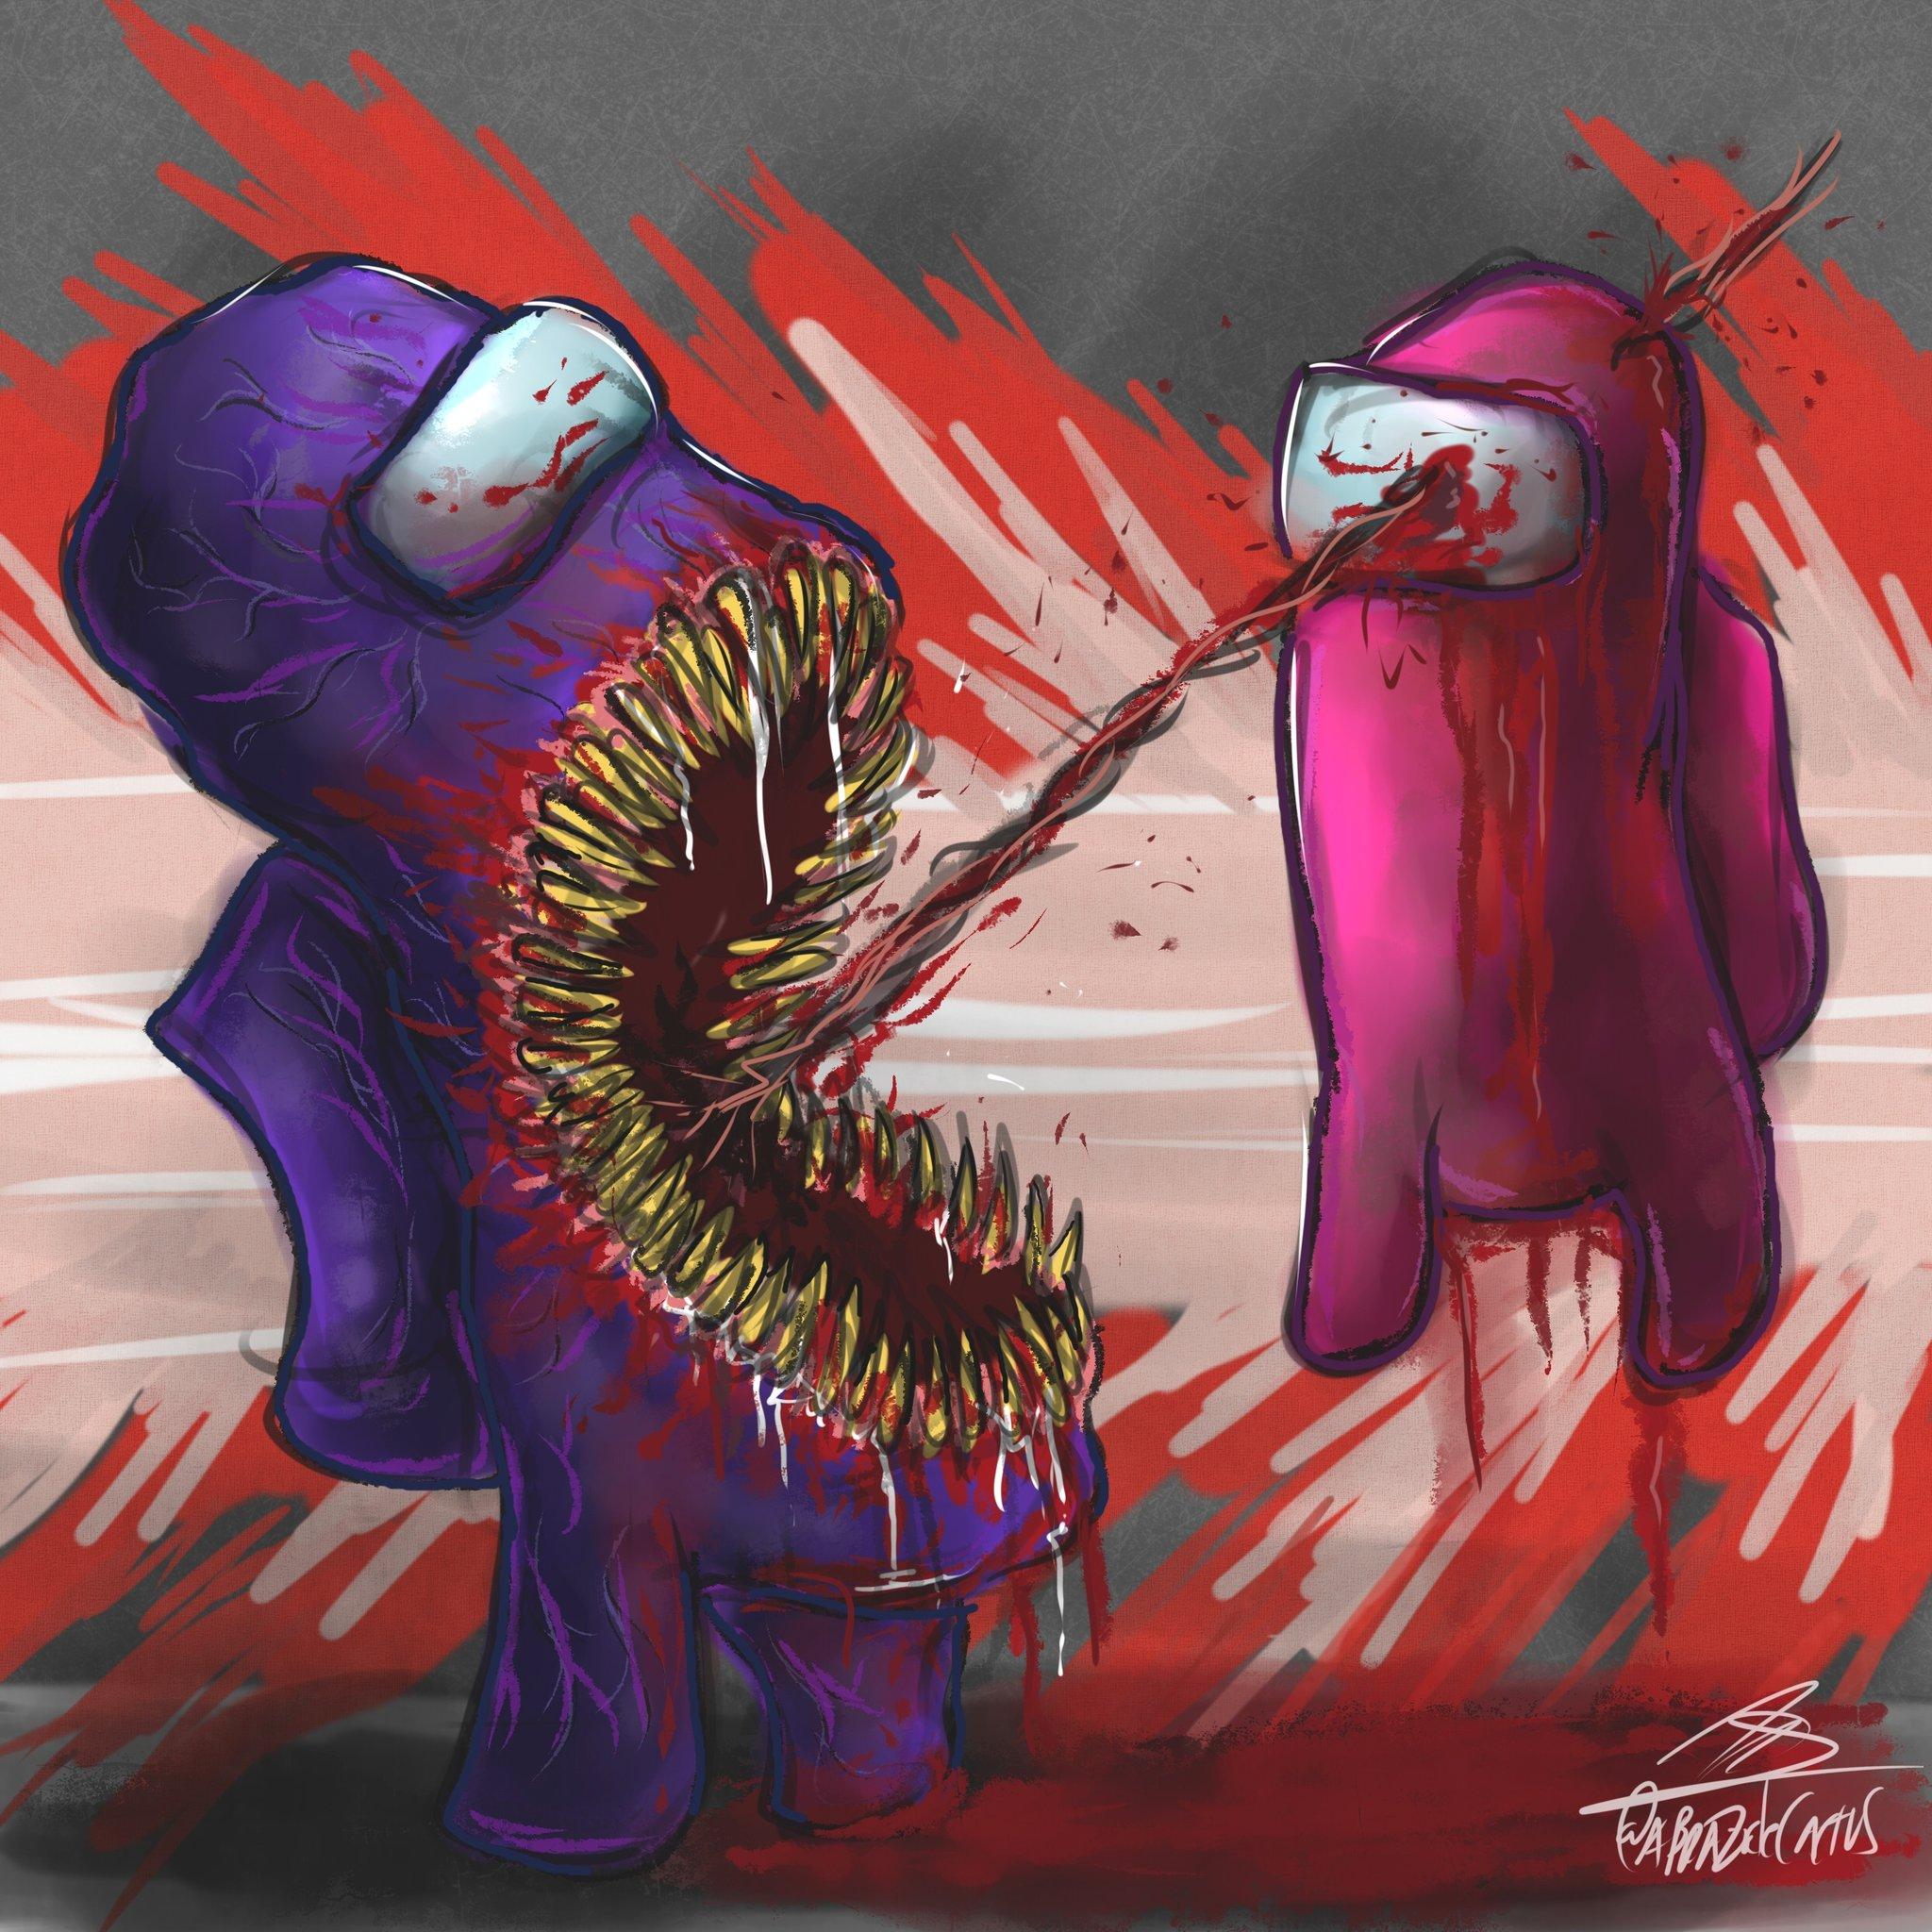 НŒðšð«ðœð®ð¬ð¬ Art Commissions Open On Twitter The Impostor Among Us Fanart Myart Draw Drawing Illustration Digitalart Digitaldrawing Digitaldraw Amongus Amongusgame Amongusfanart Https T Co Zpvtqikzae